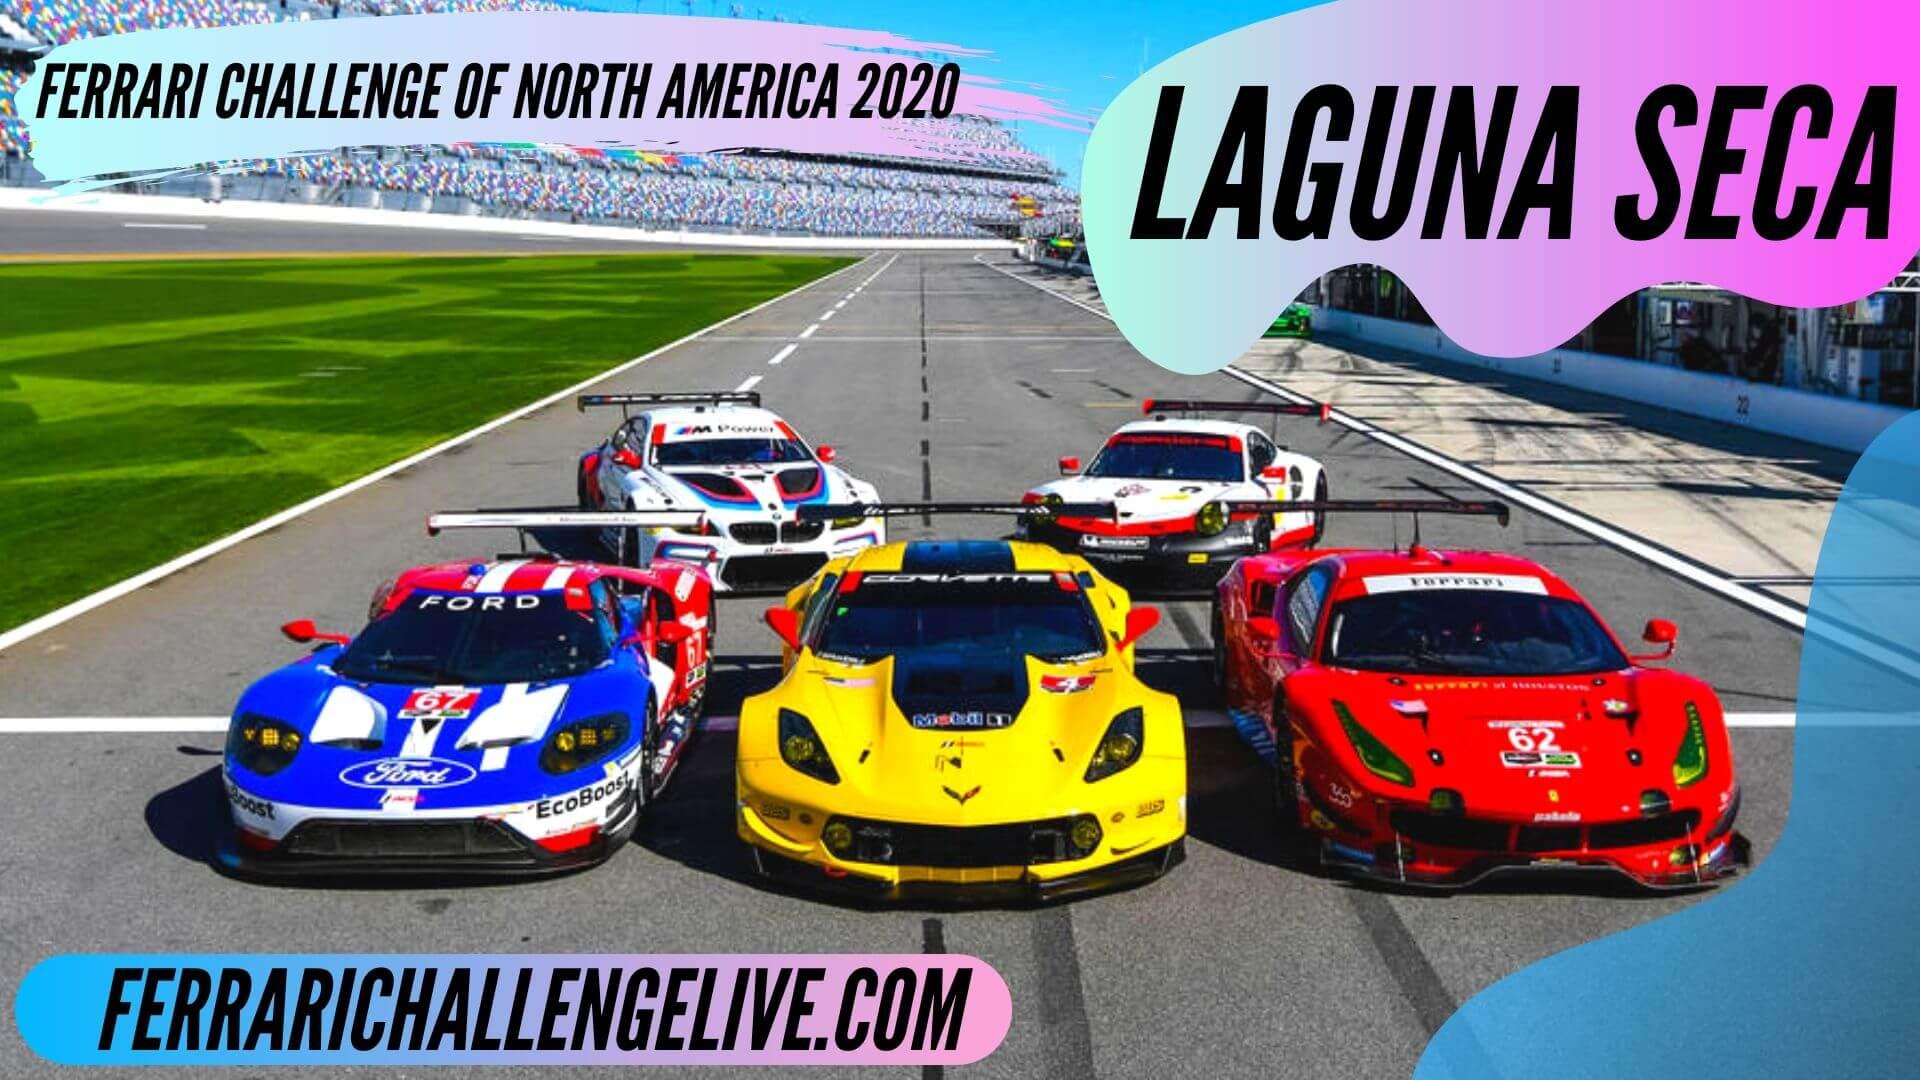 Laguna Seca Live Stream 2020 | Ferrari Challenge North America